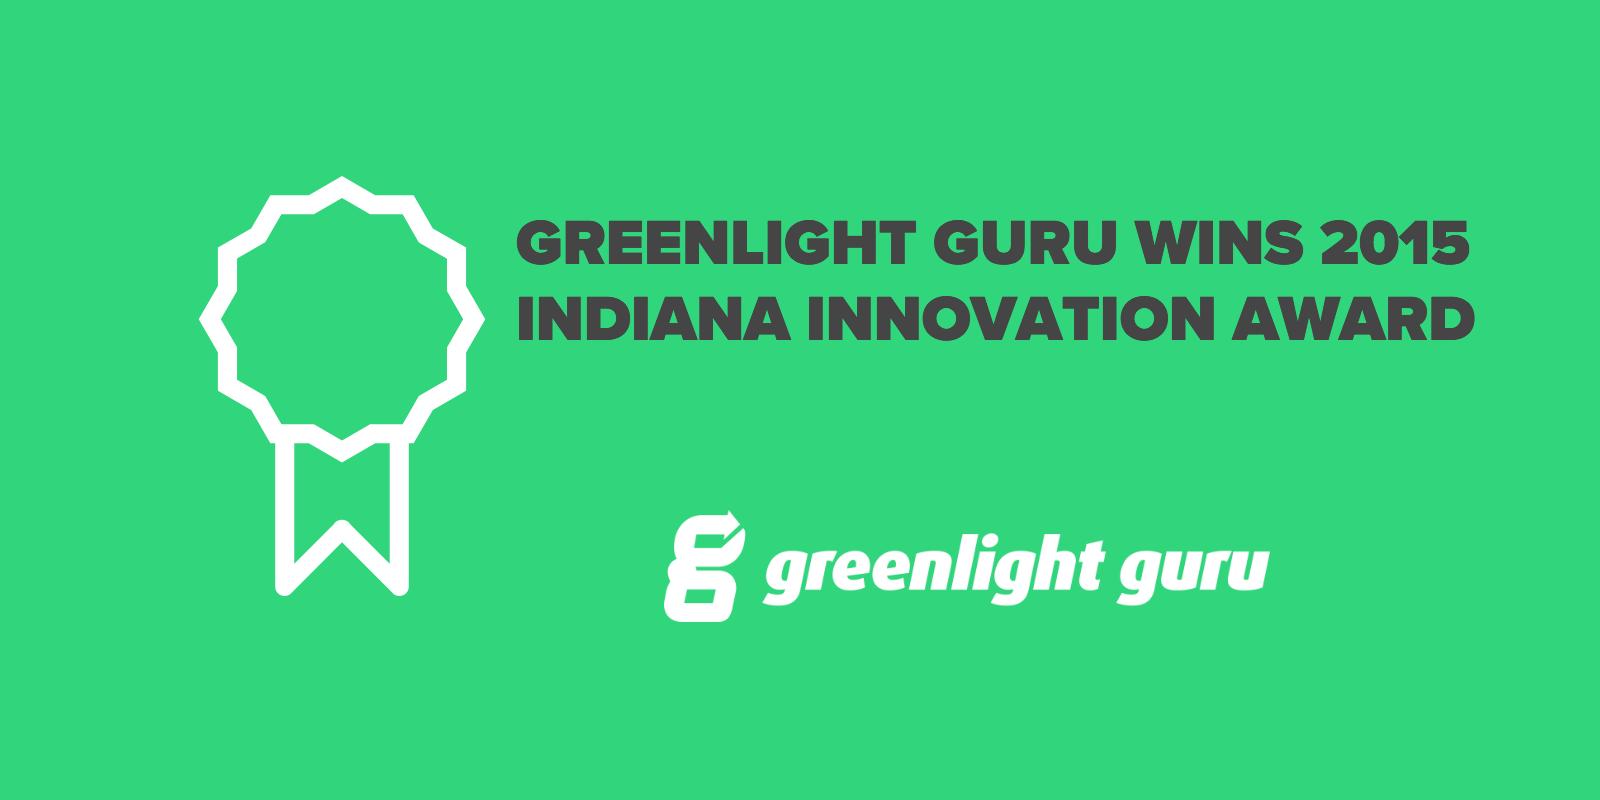 greenlight guru Wins 2015 Indiana Innovation Award - Featured Image